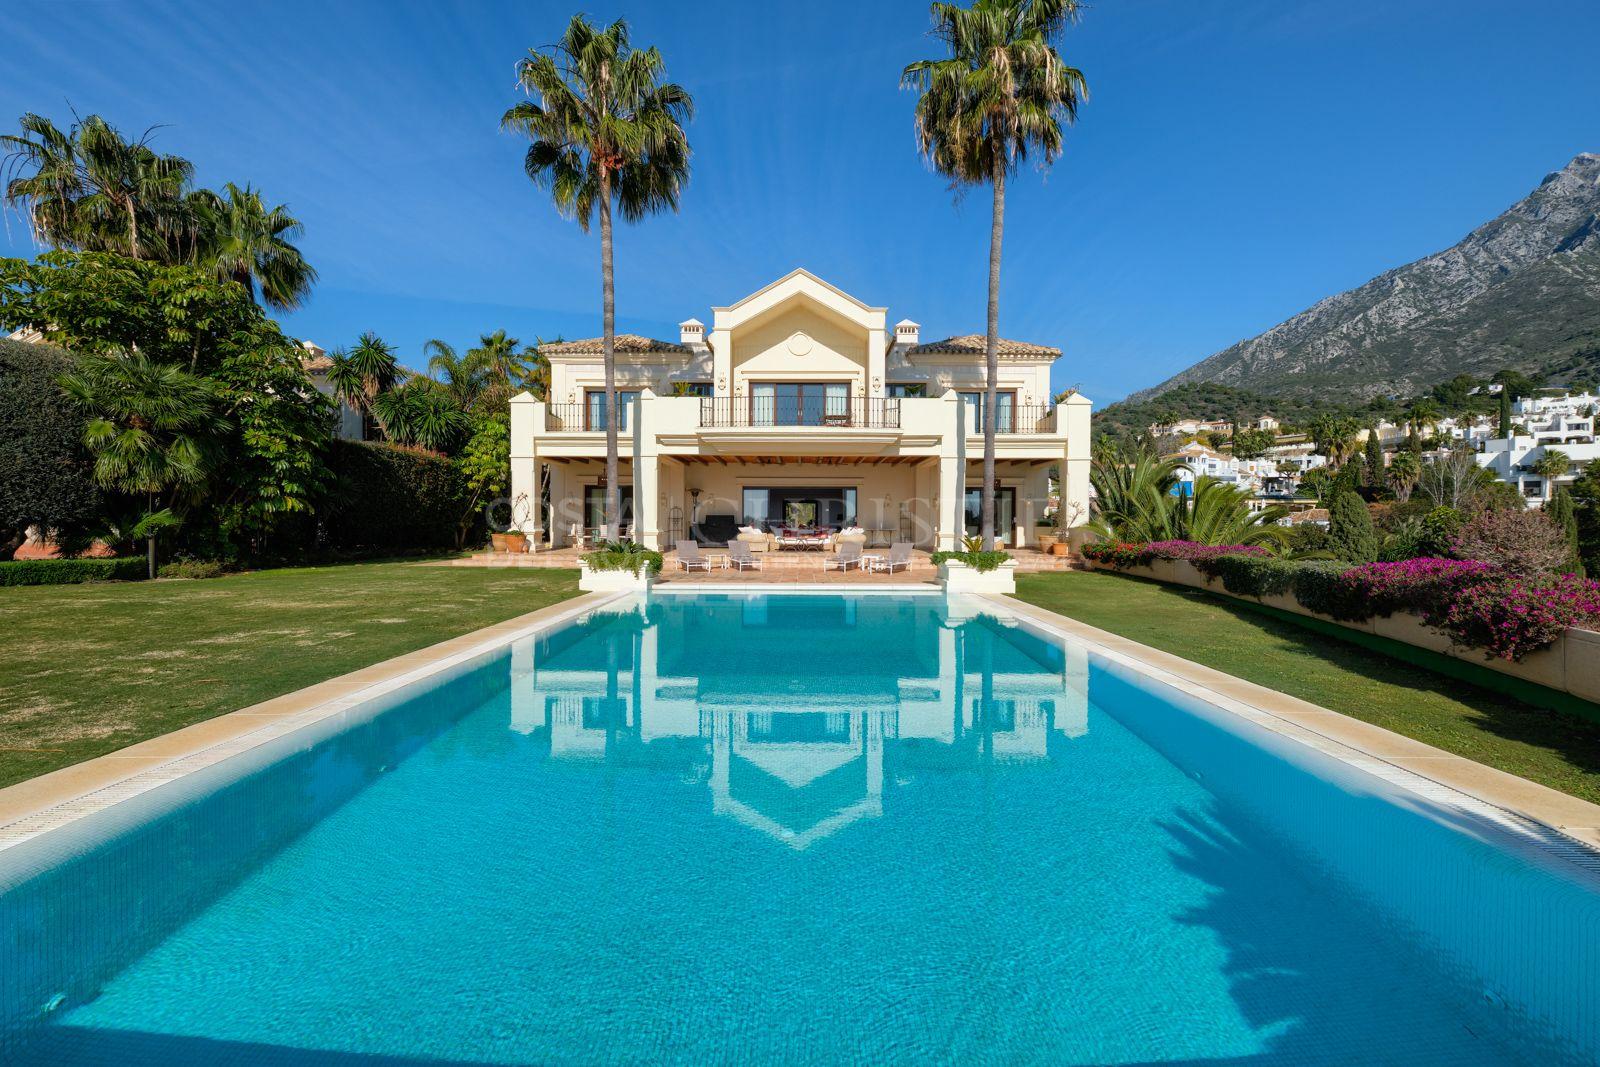 Spectacular Villa in Marbella Hill Club, Marbella Golden Mile | Christie's International Real Estate